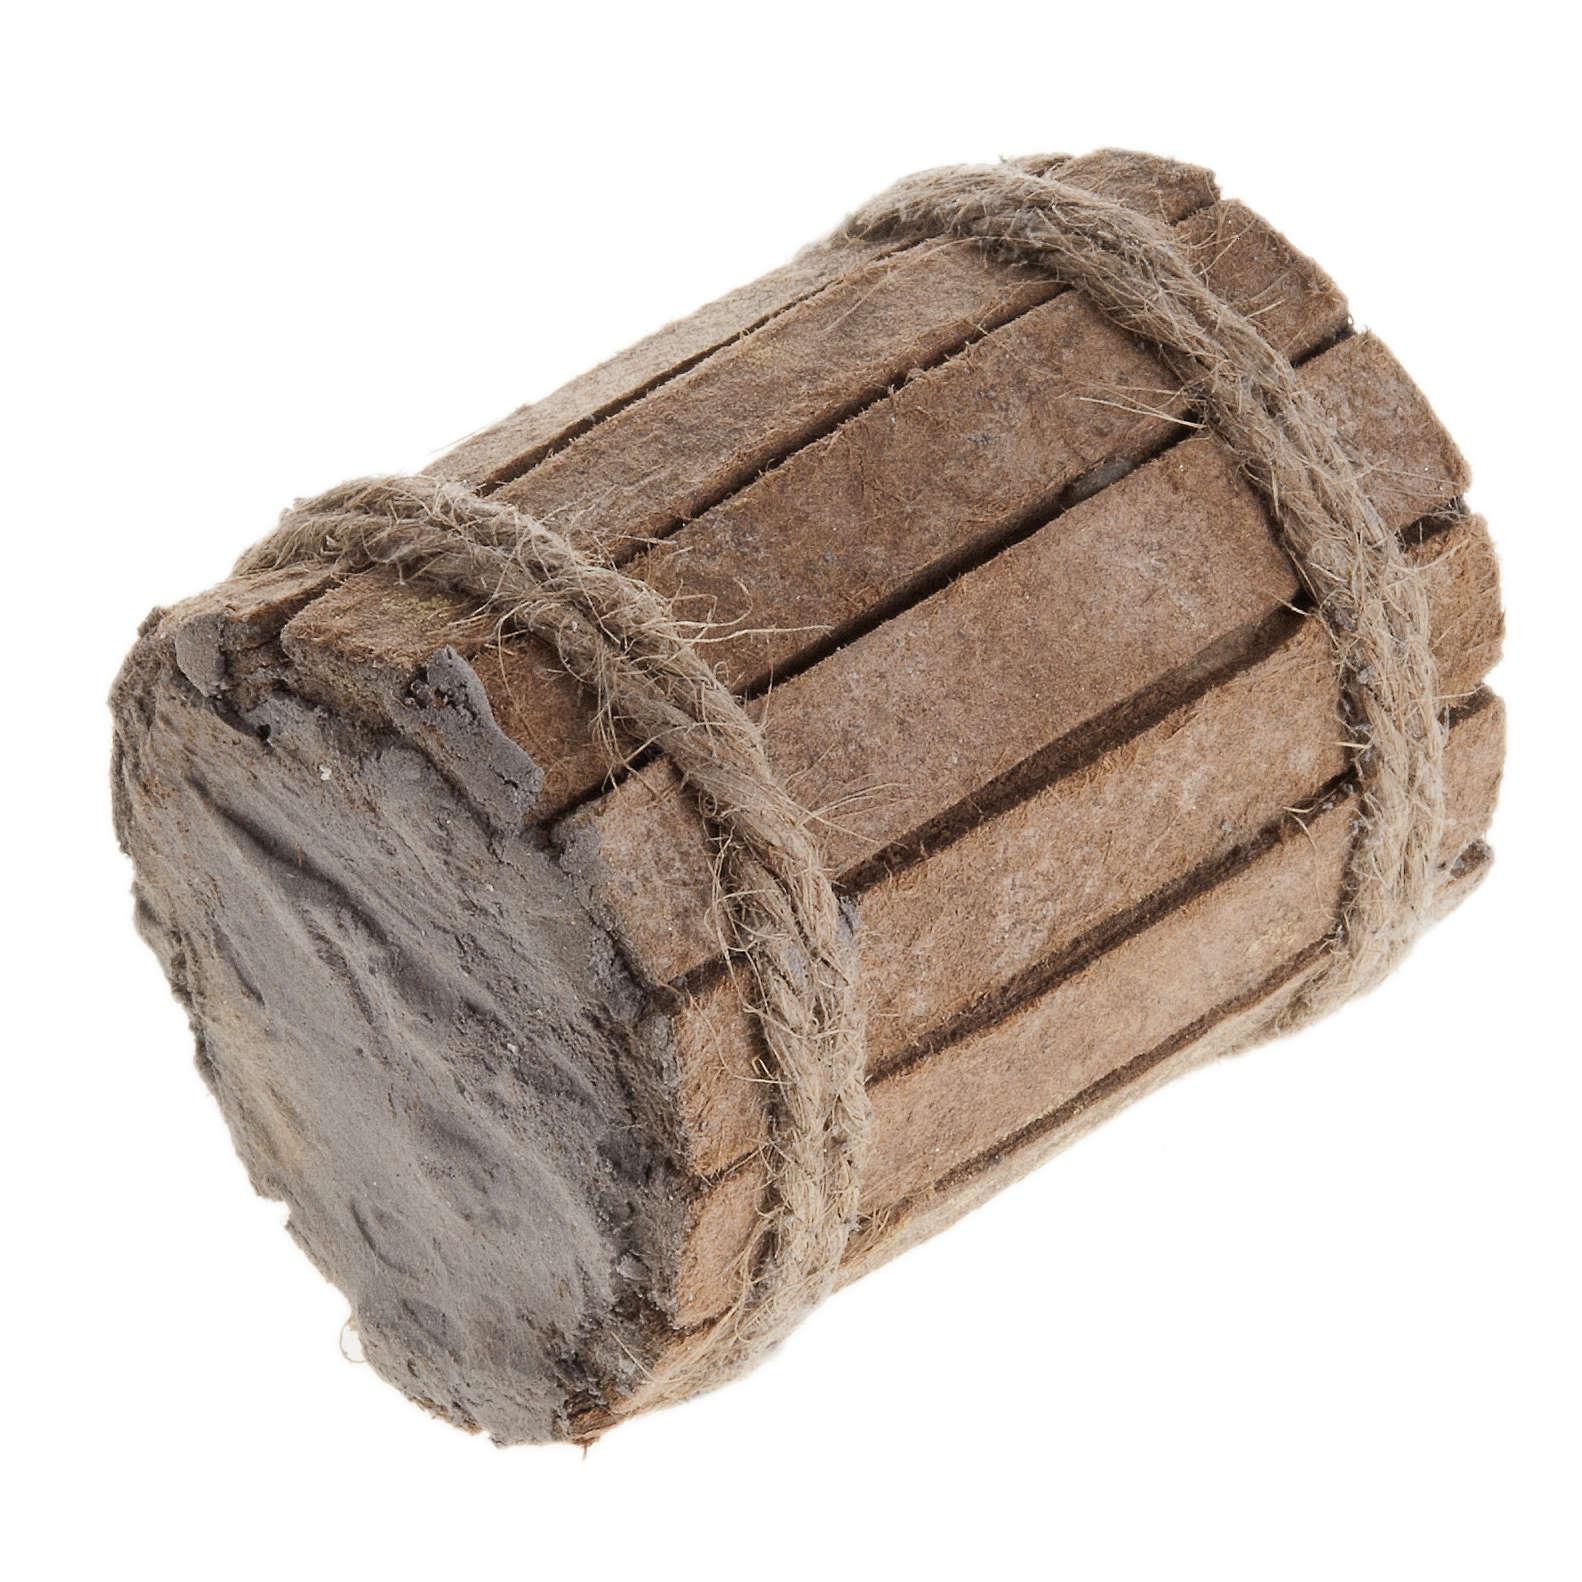 Botte legno presepe 4